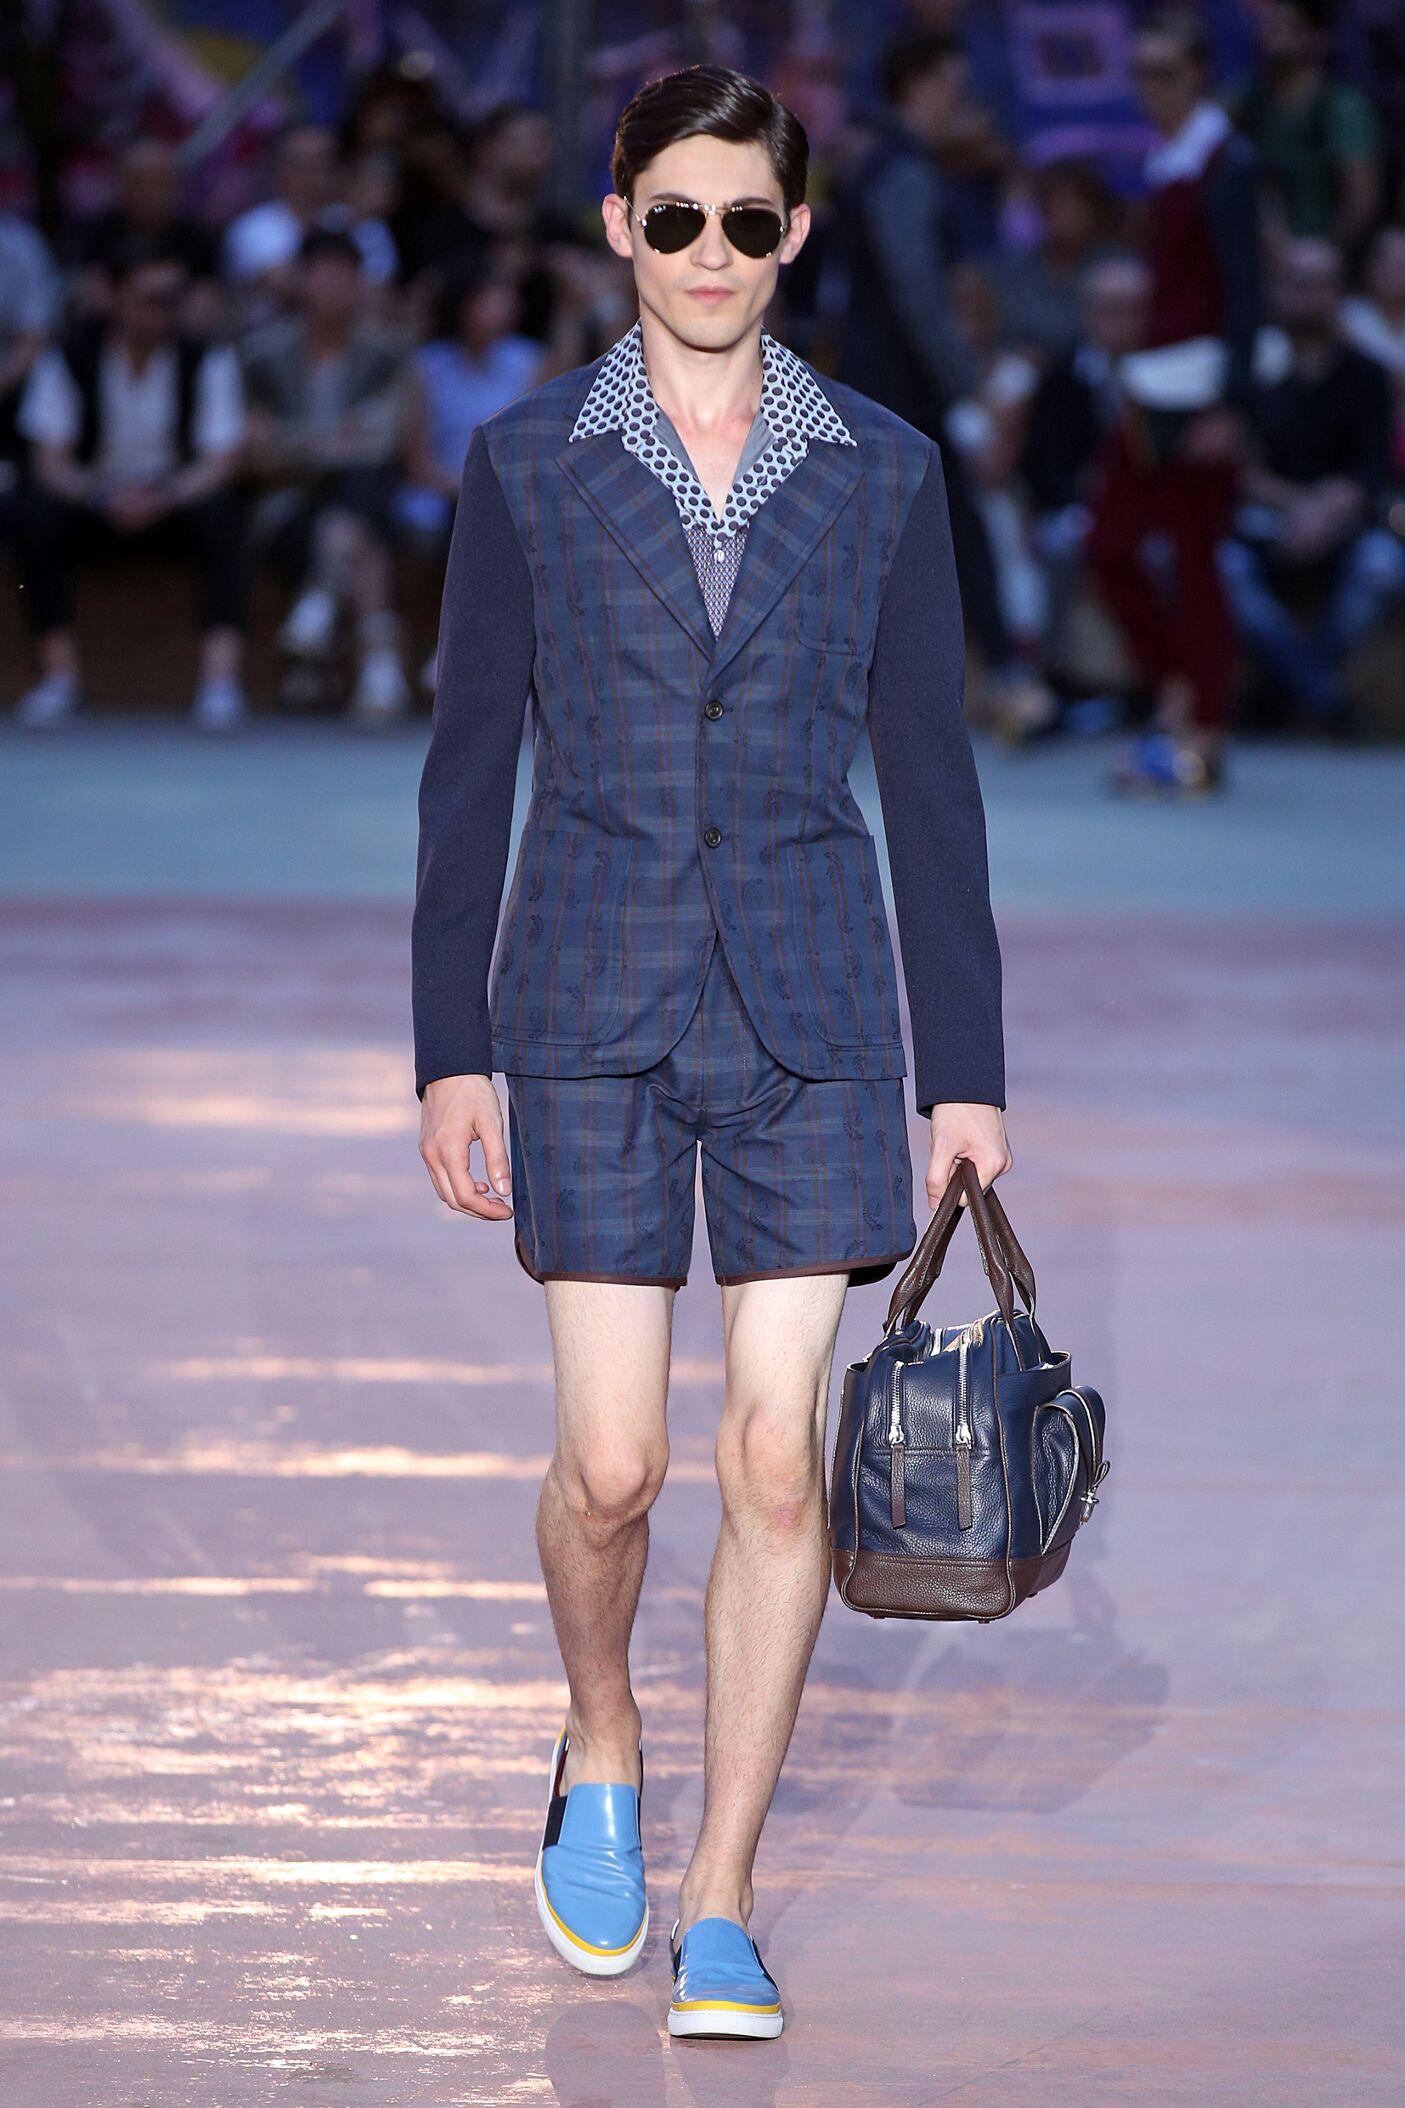 Runway Antonio Marras Spring Summer 2015 Men's Collection Milan Fashion Week